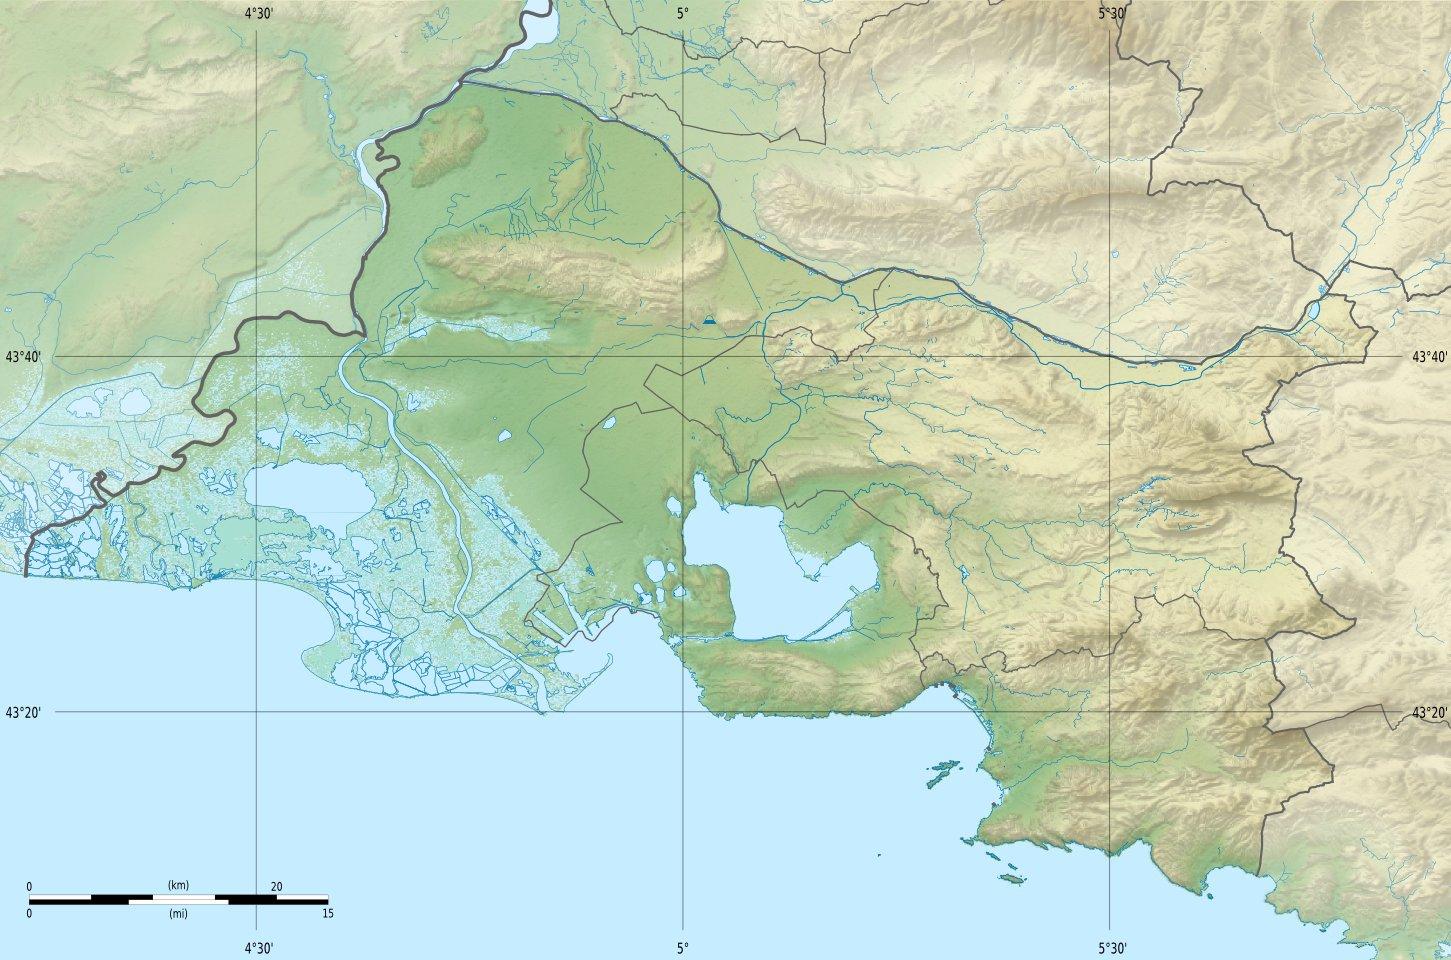 Fichier bouches du rh ne department relief location map for Bouche rhone